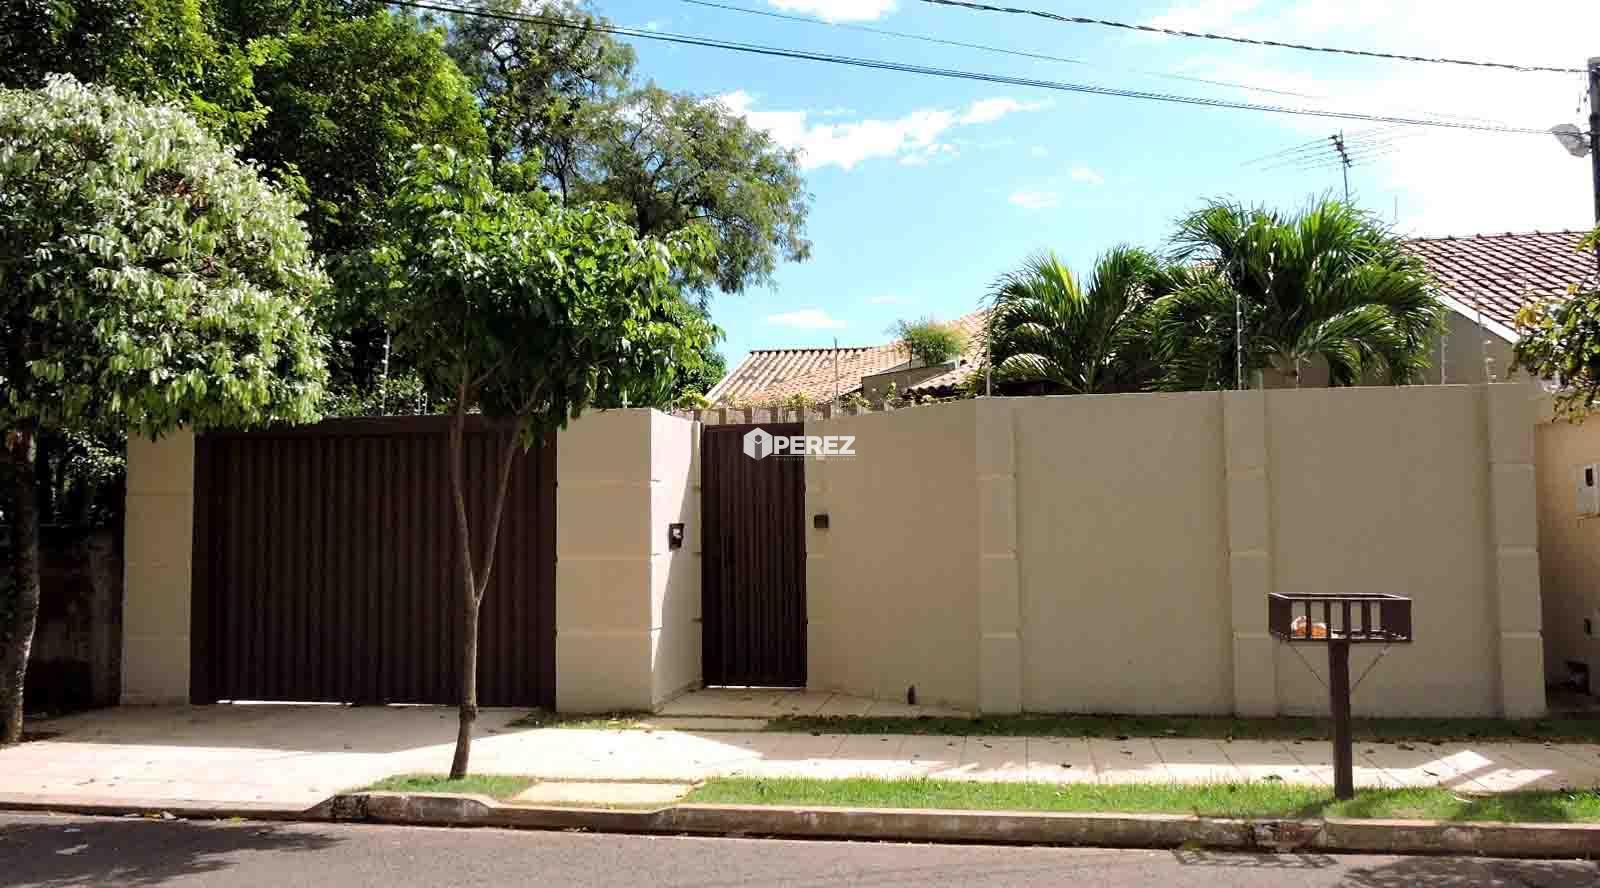 venda-campo-grande-ms-casa-terrea-tinhorao-cidade-jardim-perez-imoveis